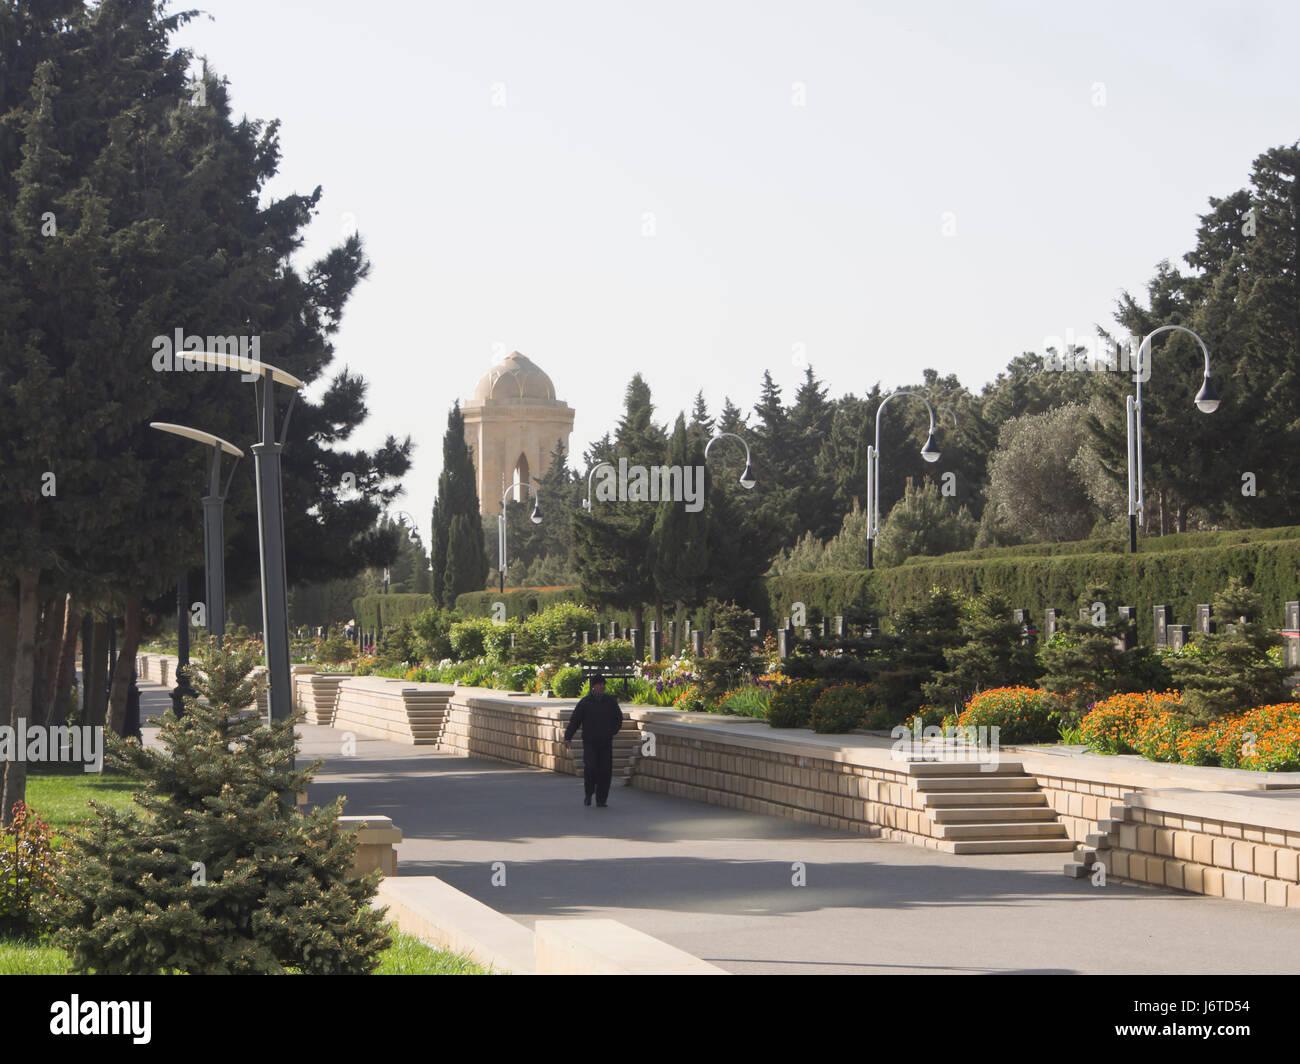 Martyrs' Lane, cemetery and memorial in Baku Azerbaijan, has  graves from Black January 1990 and Nagorno-Karabakh Stock Photo